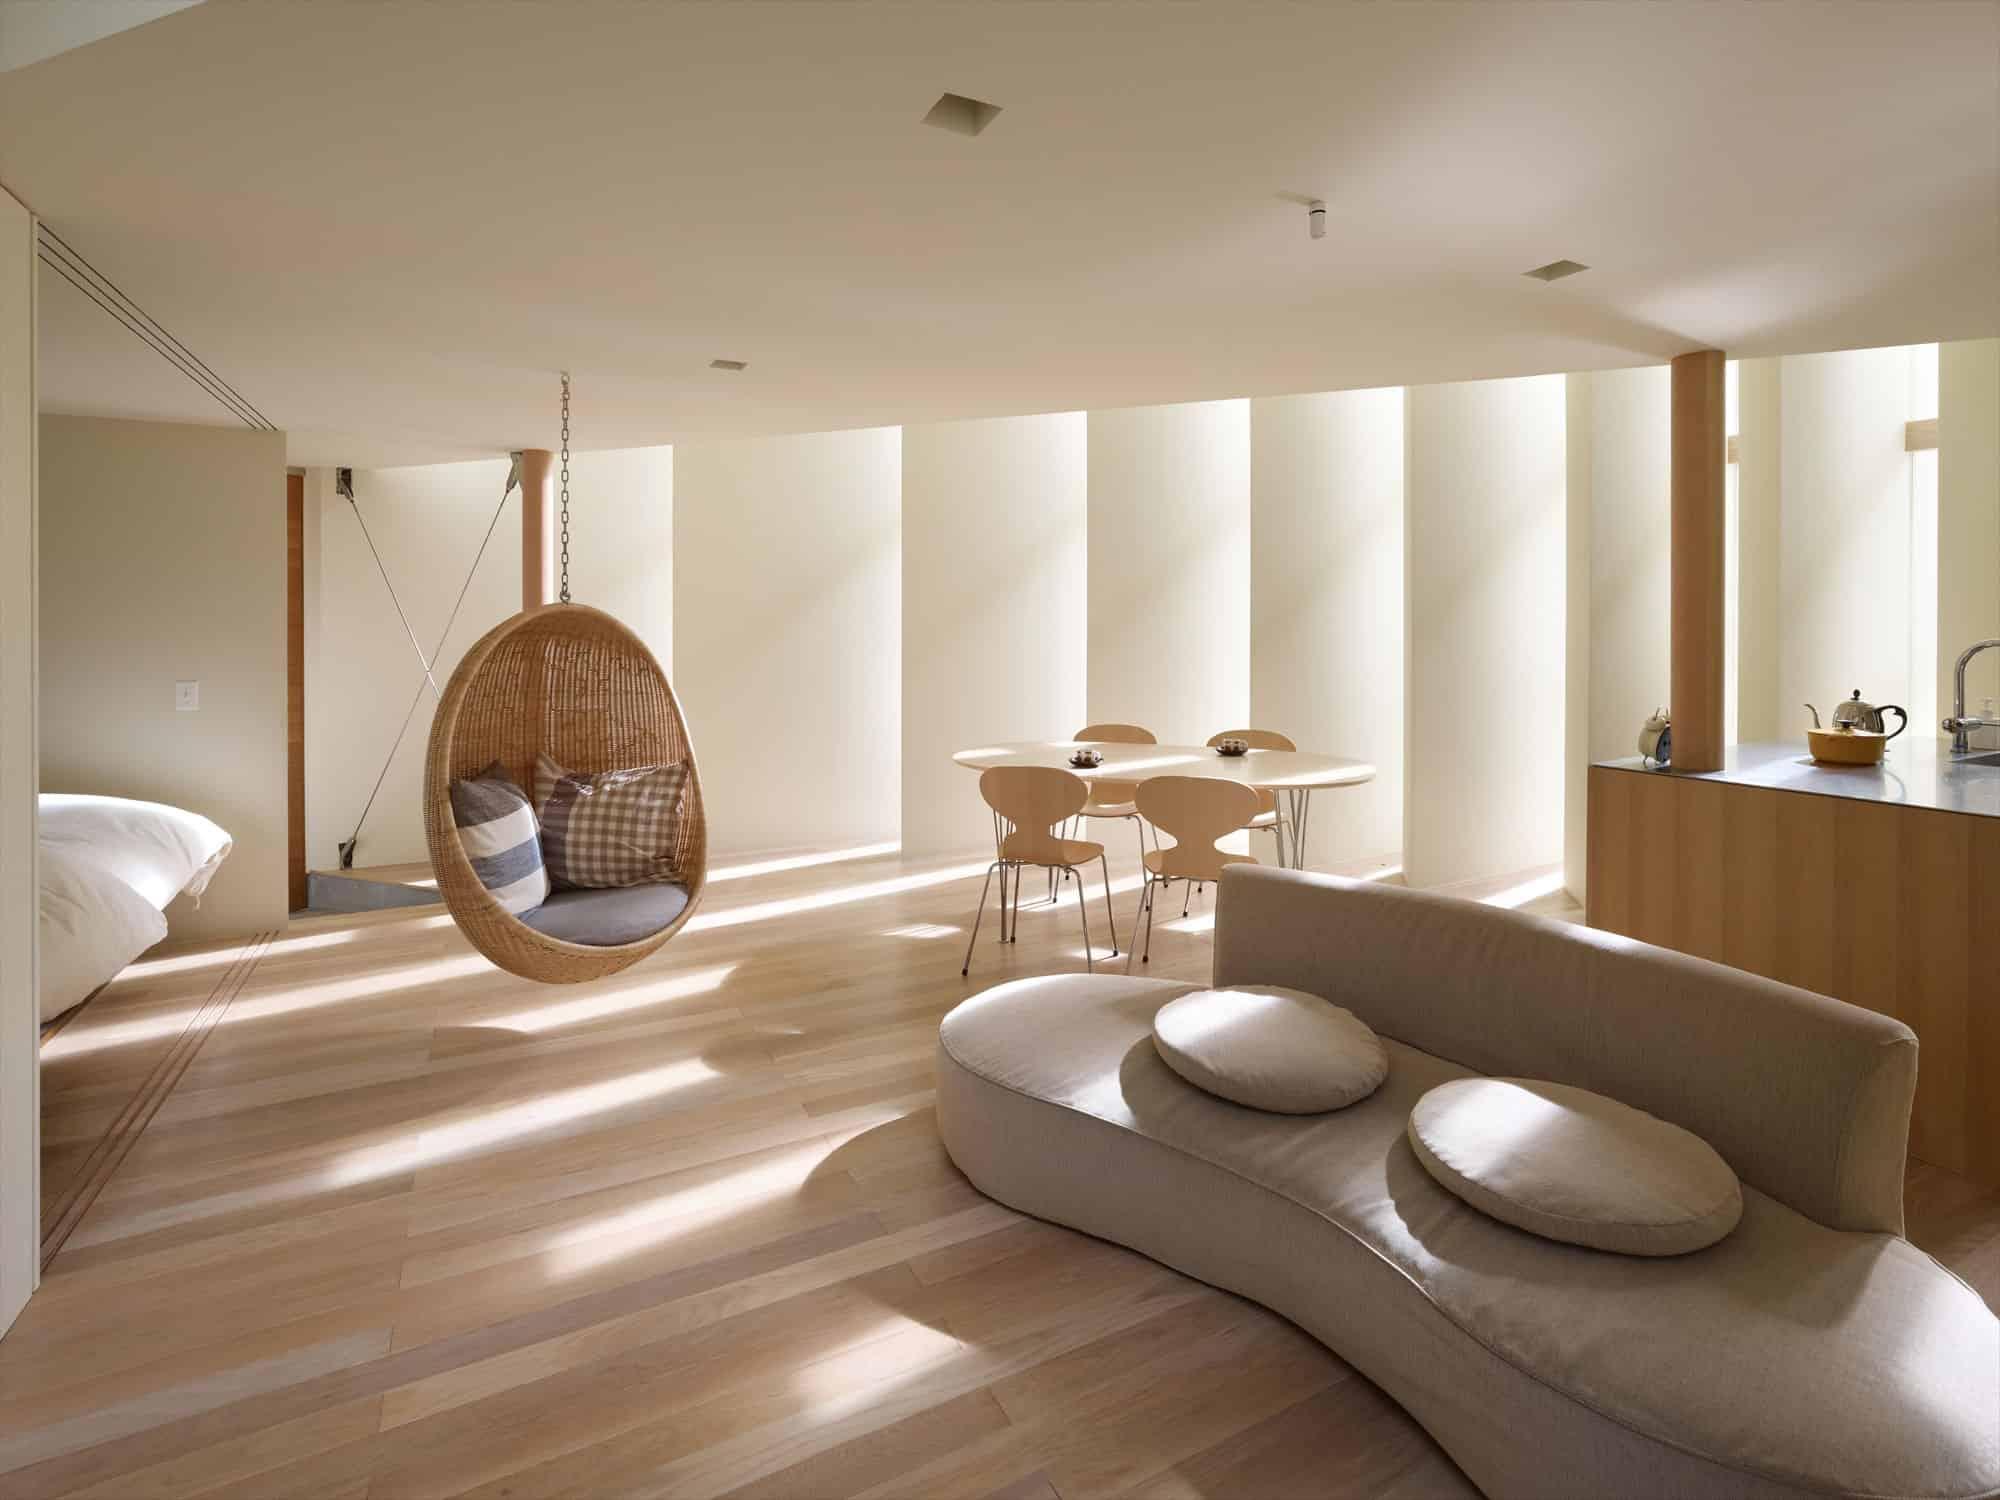 House in Muko by Fujiwarramuro Architects (2)